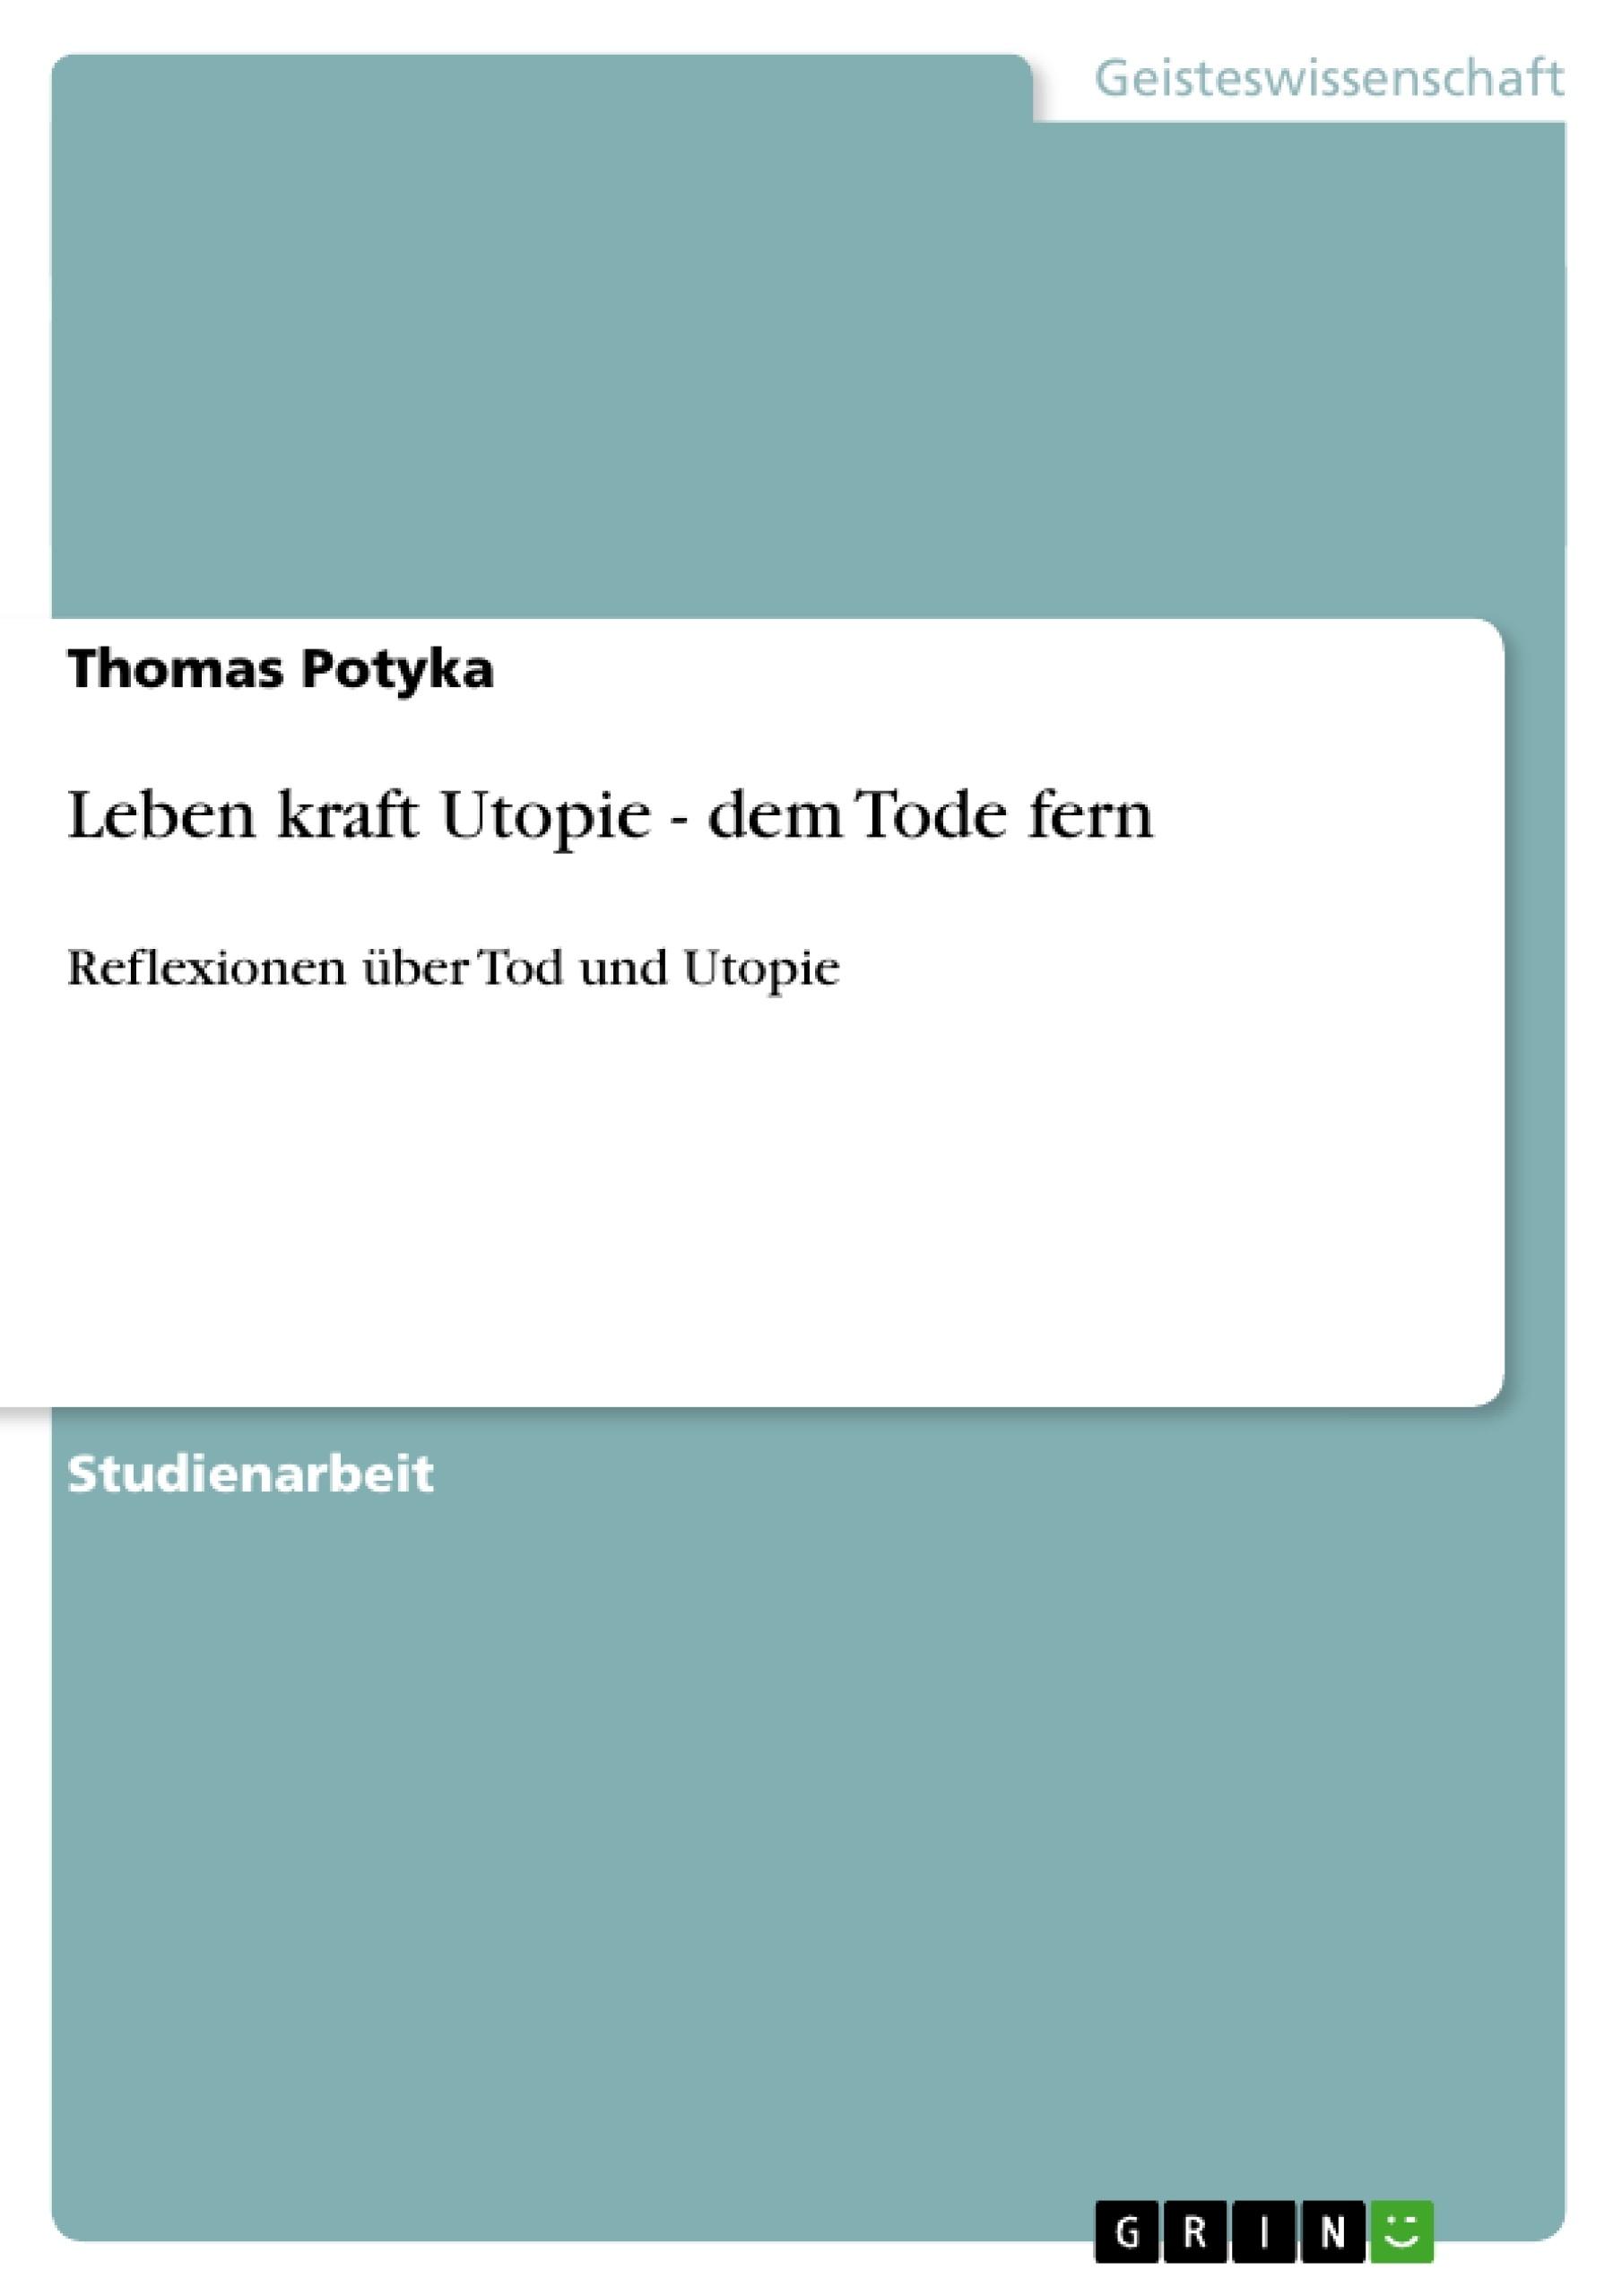 Titel: Leben kraft Utopie - dem Tode fern